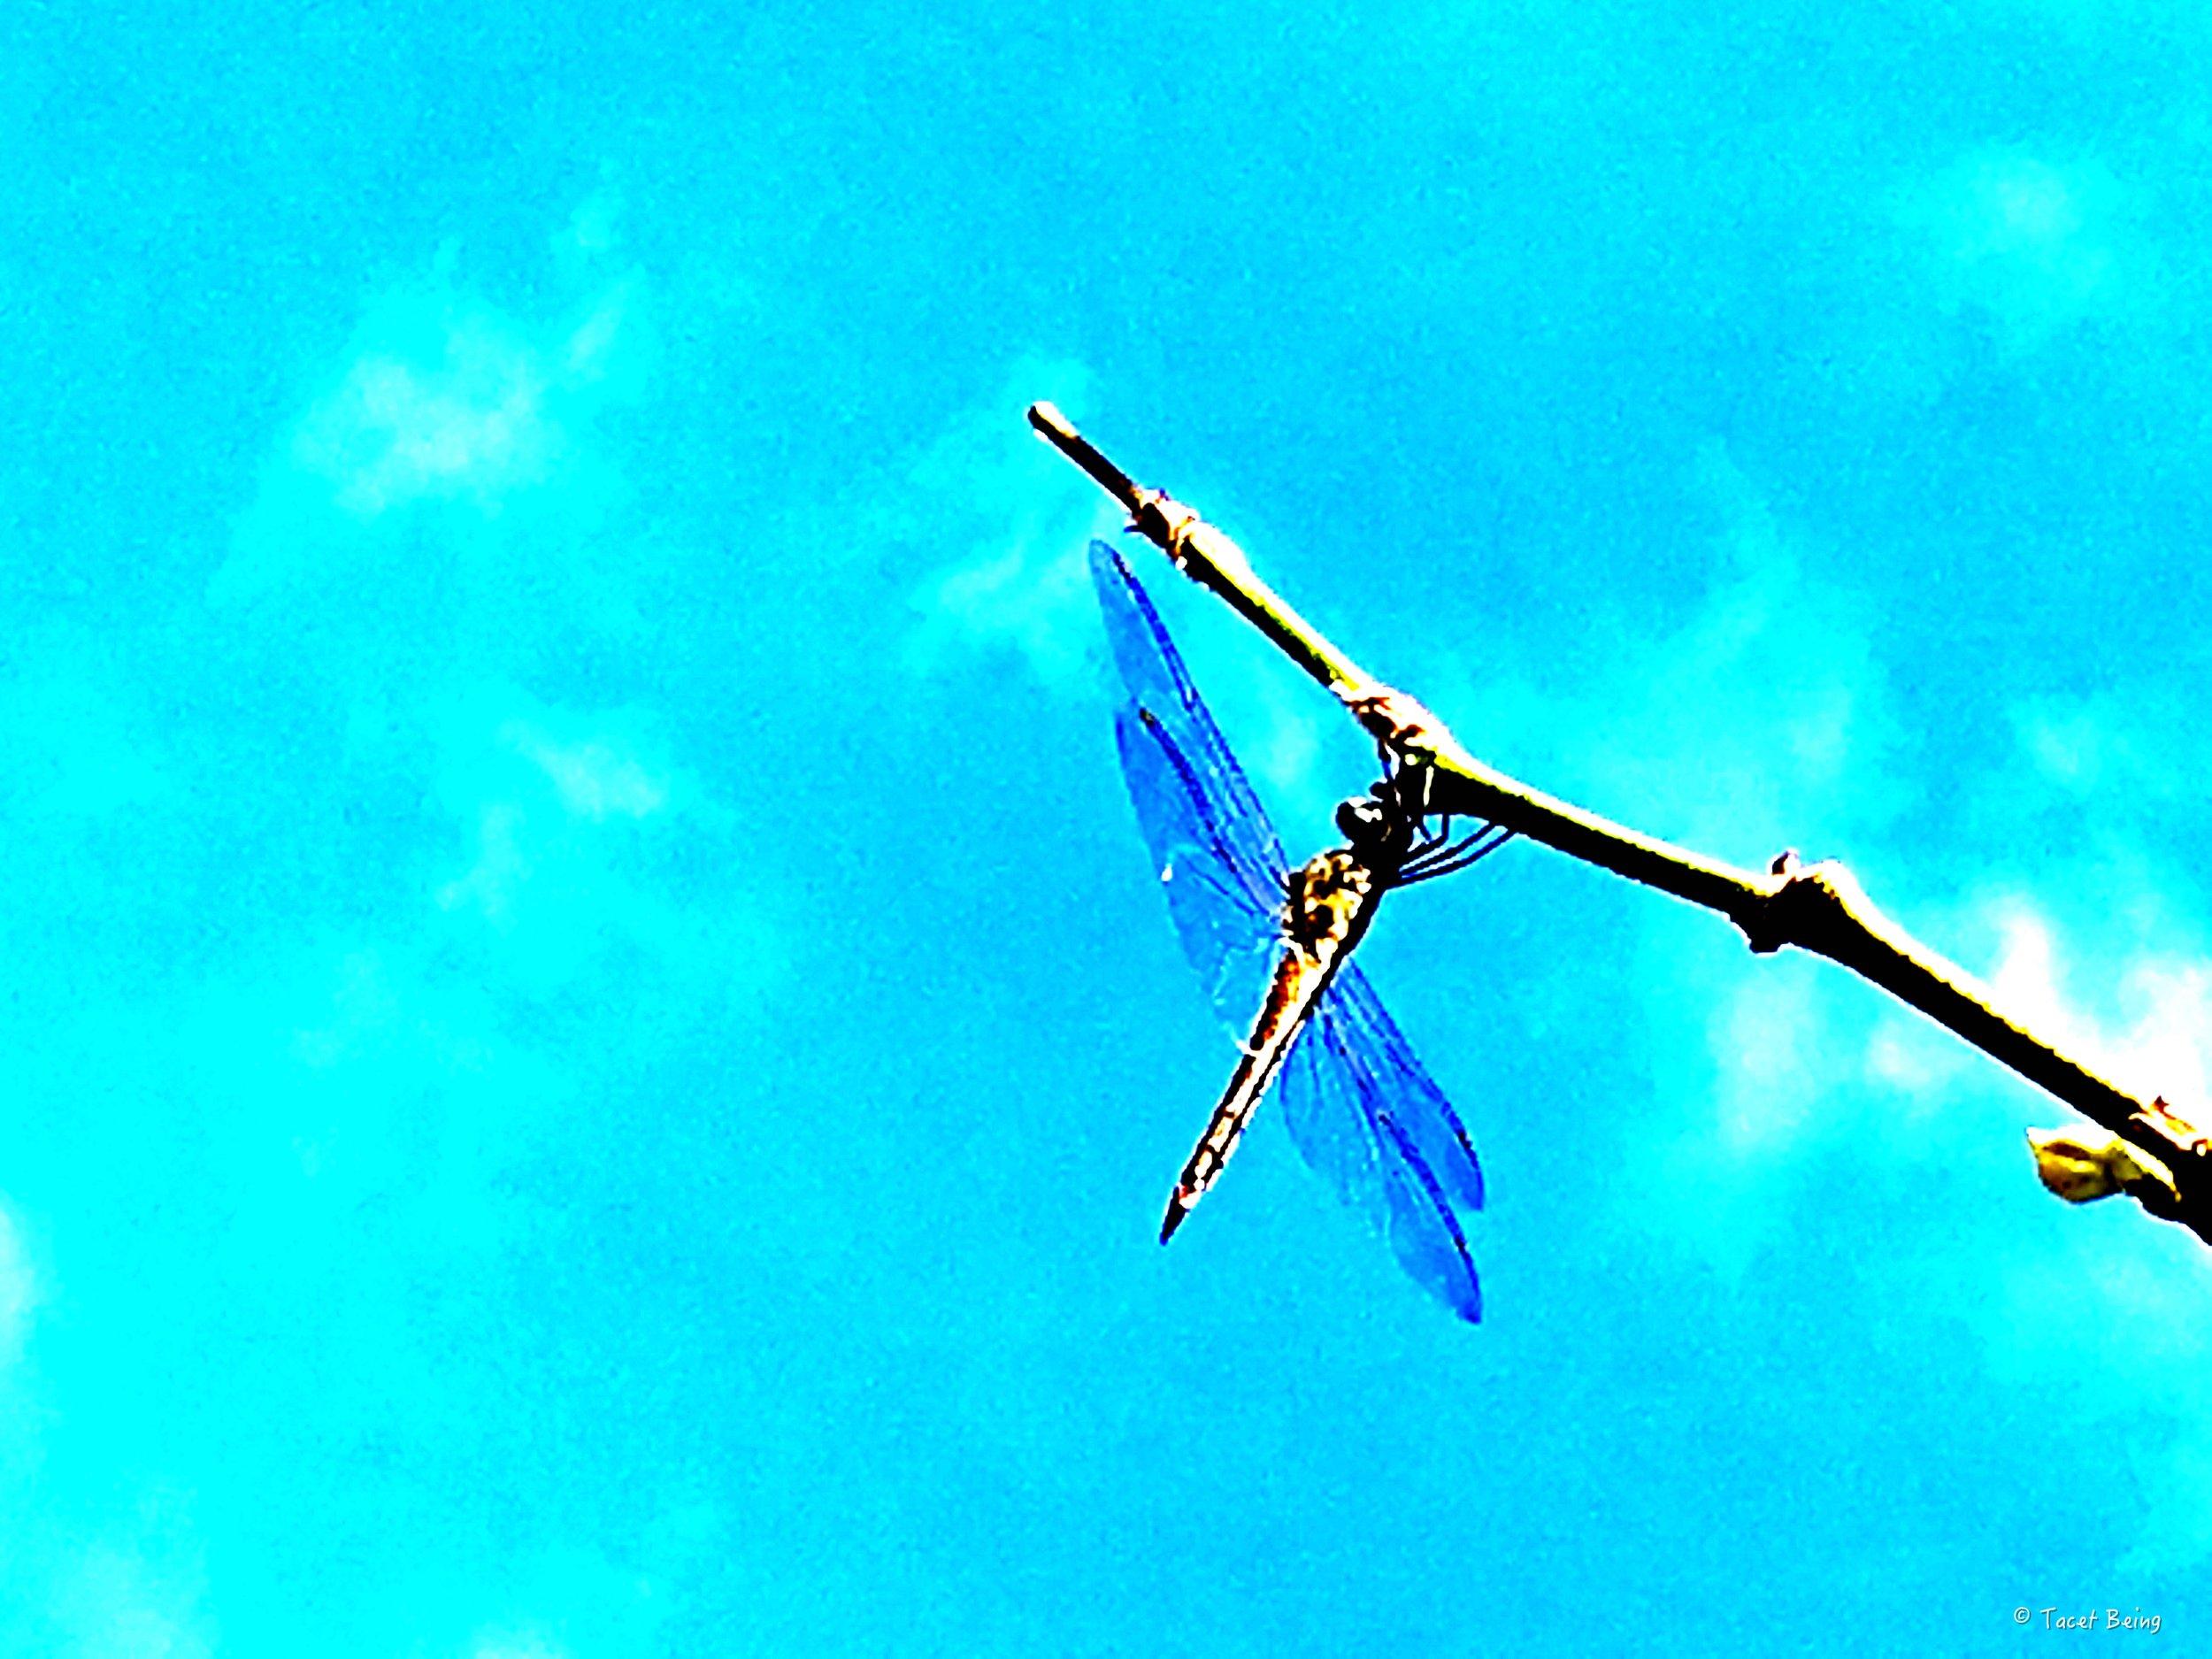 dragonfly on stick_tb.jpg